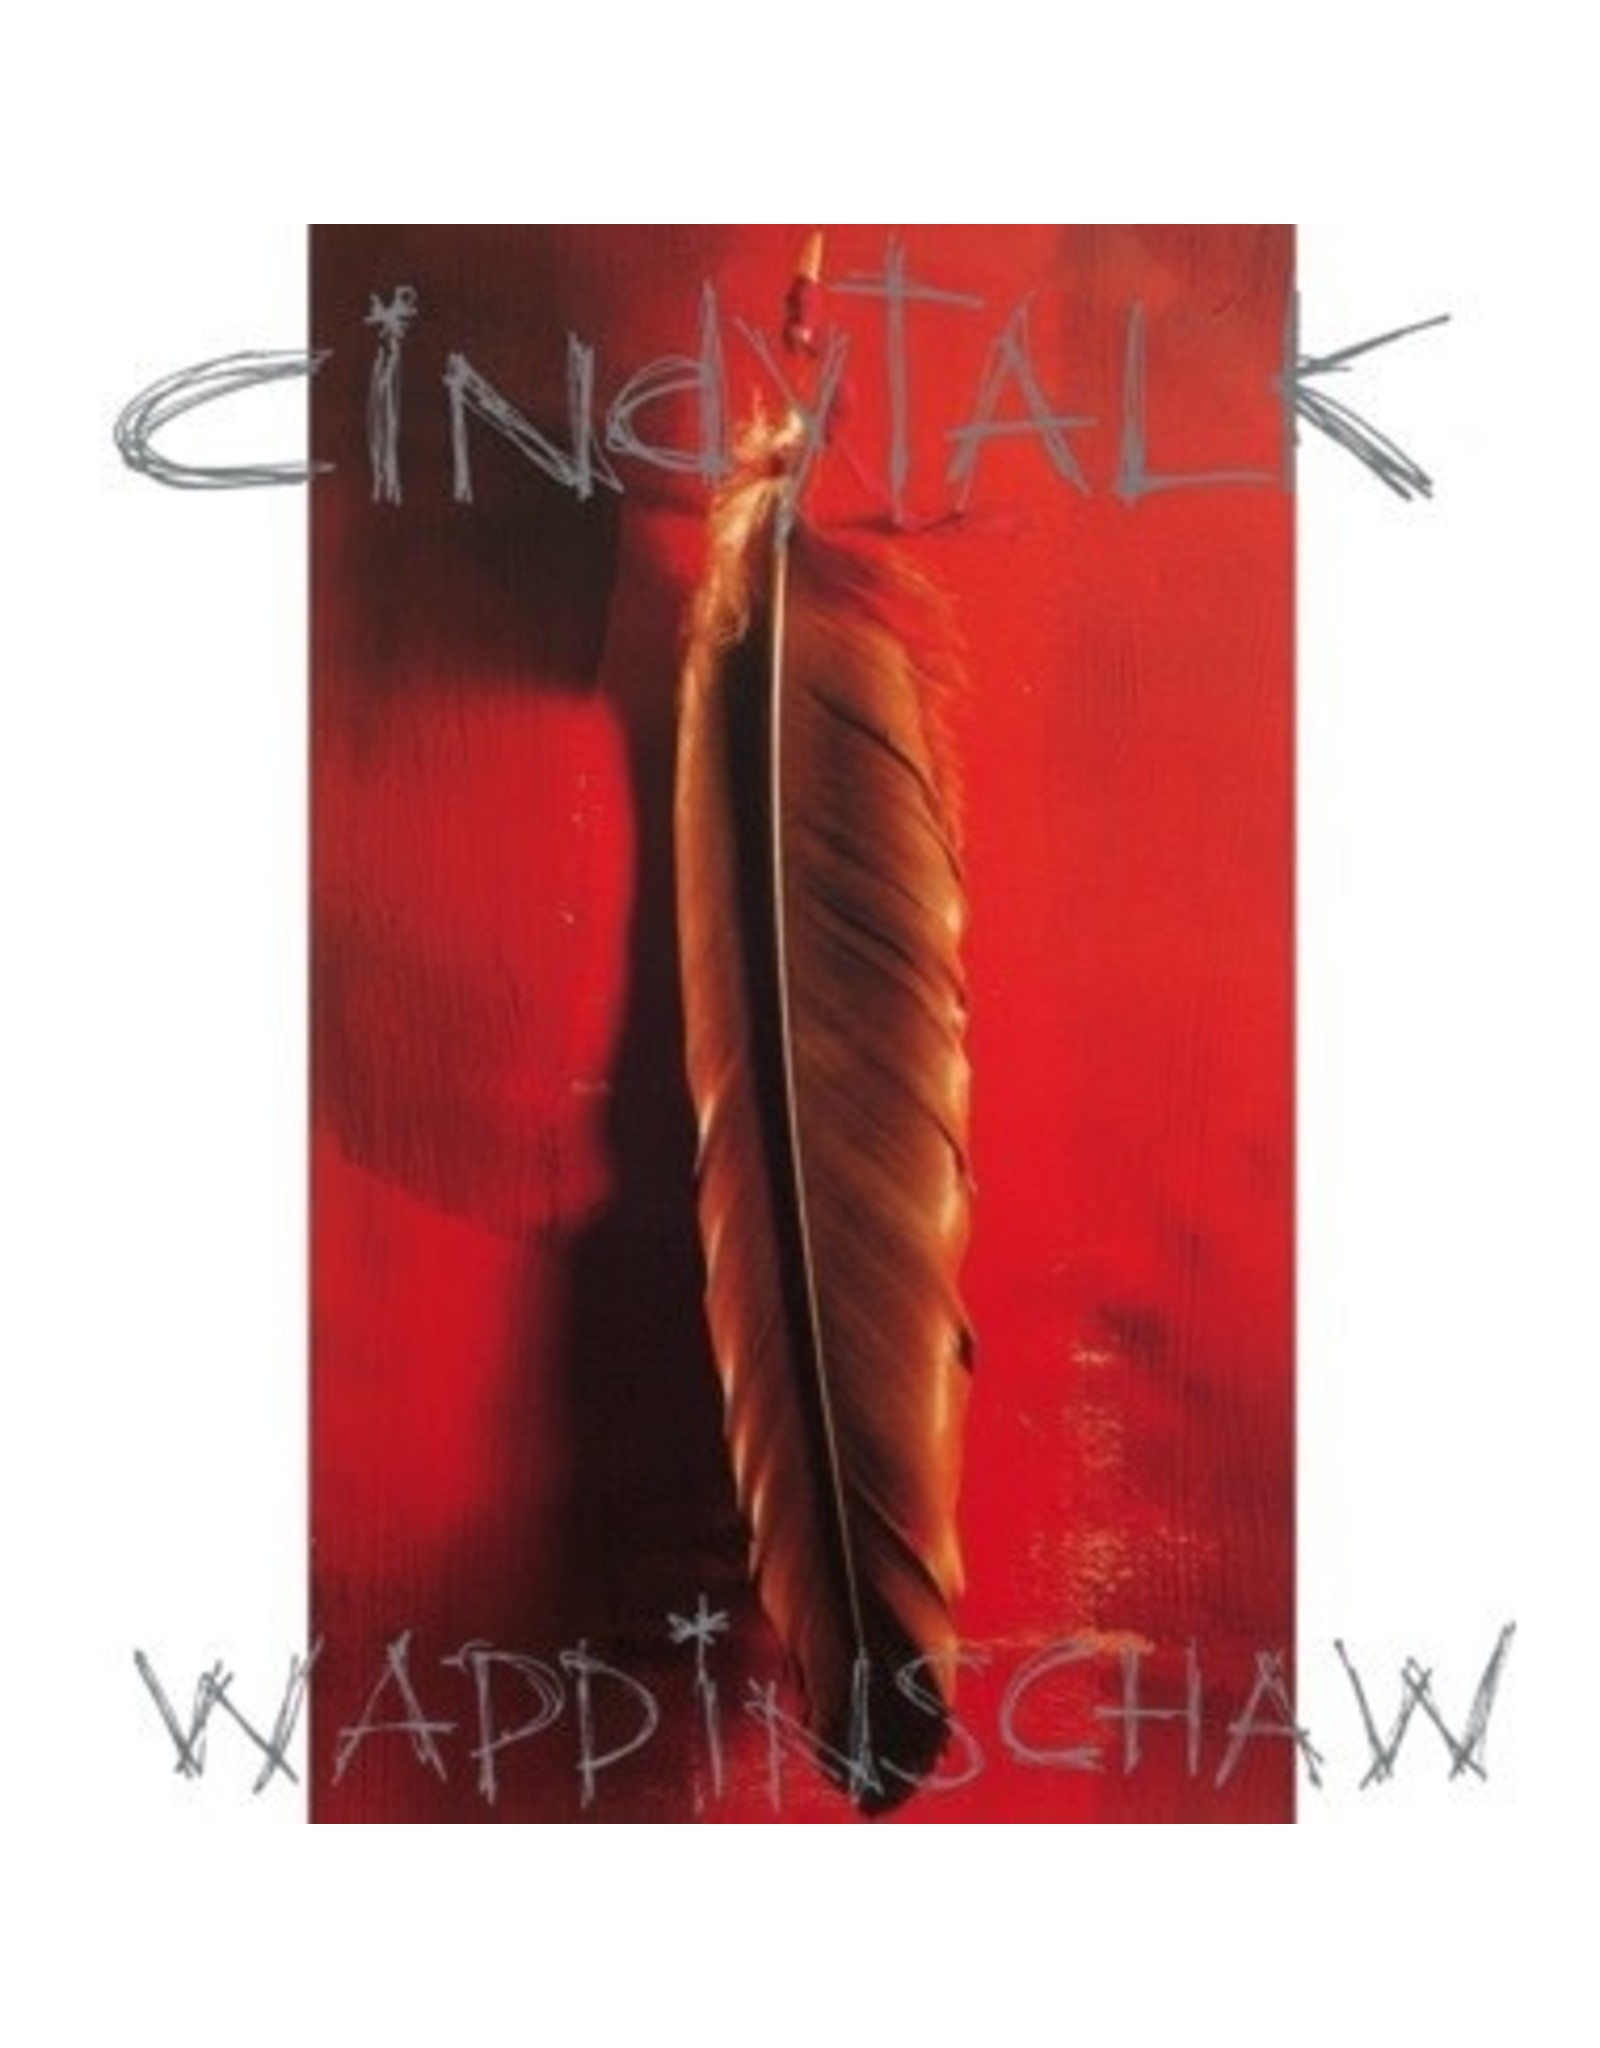 New Vinyl Cindytalk - Wappinschaw (Colored) LP